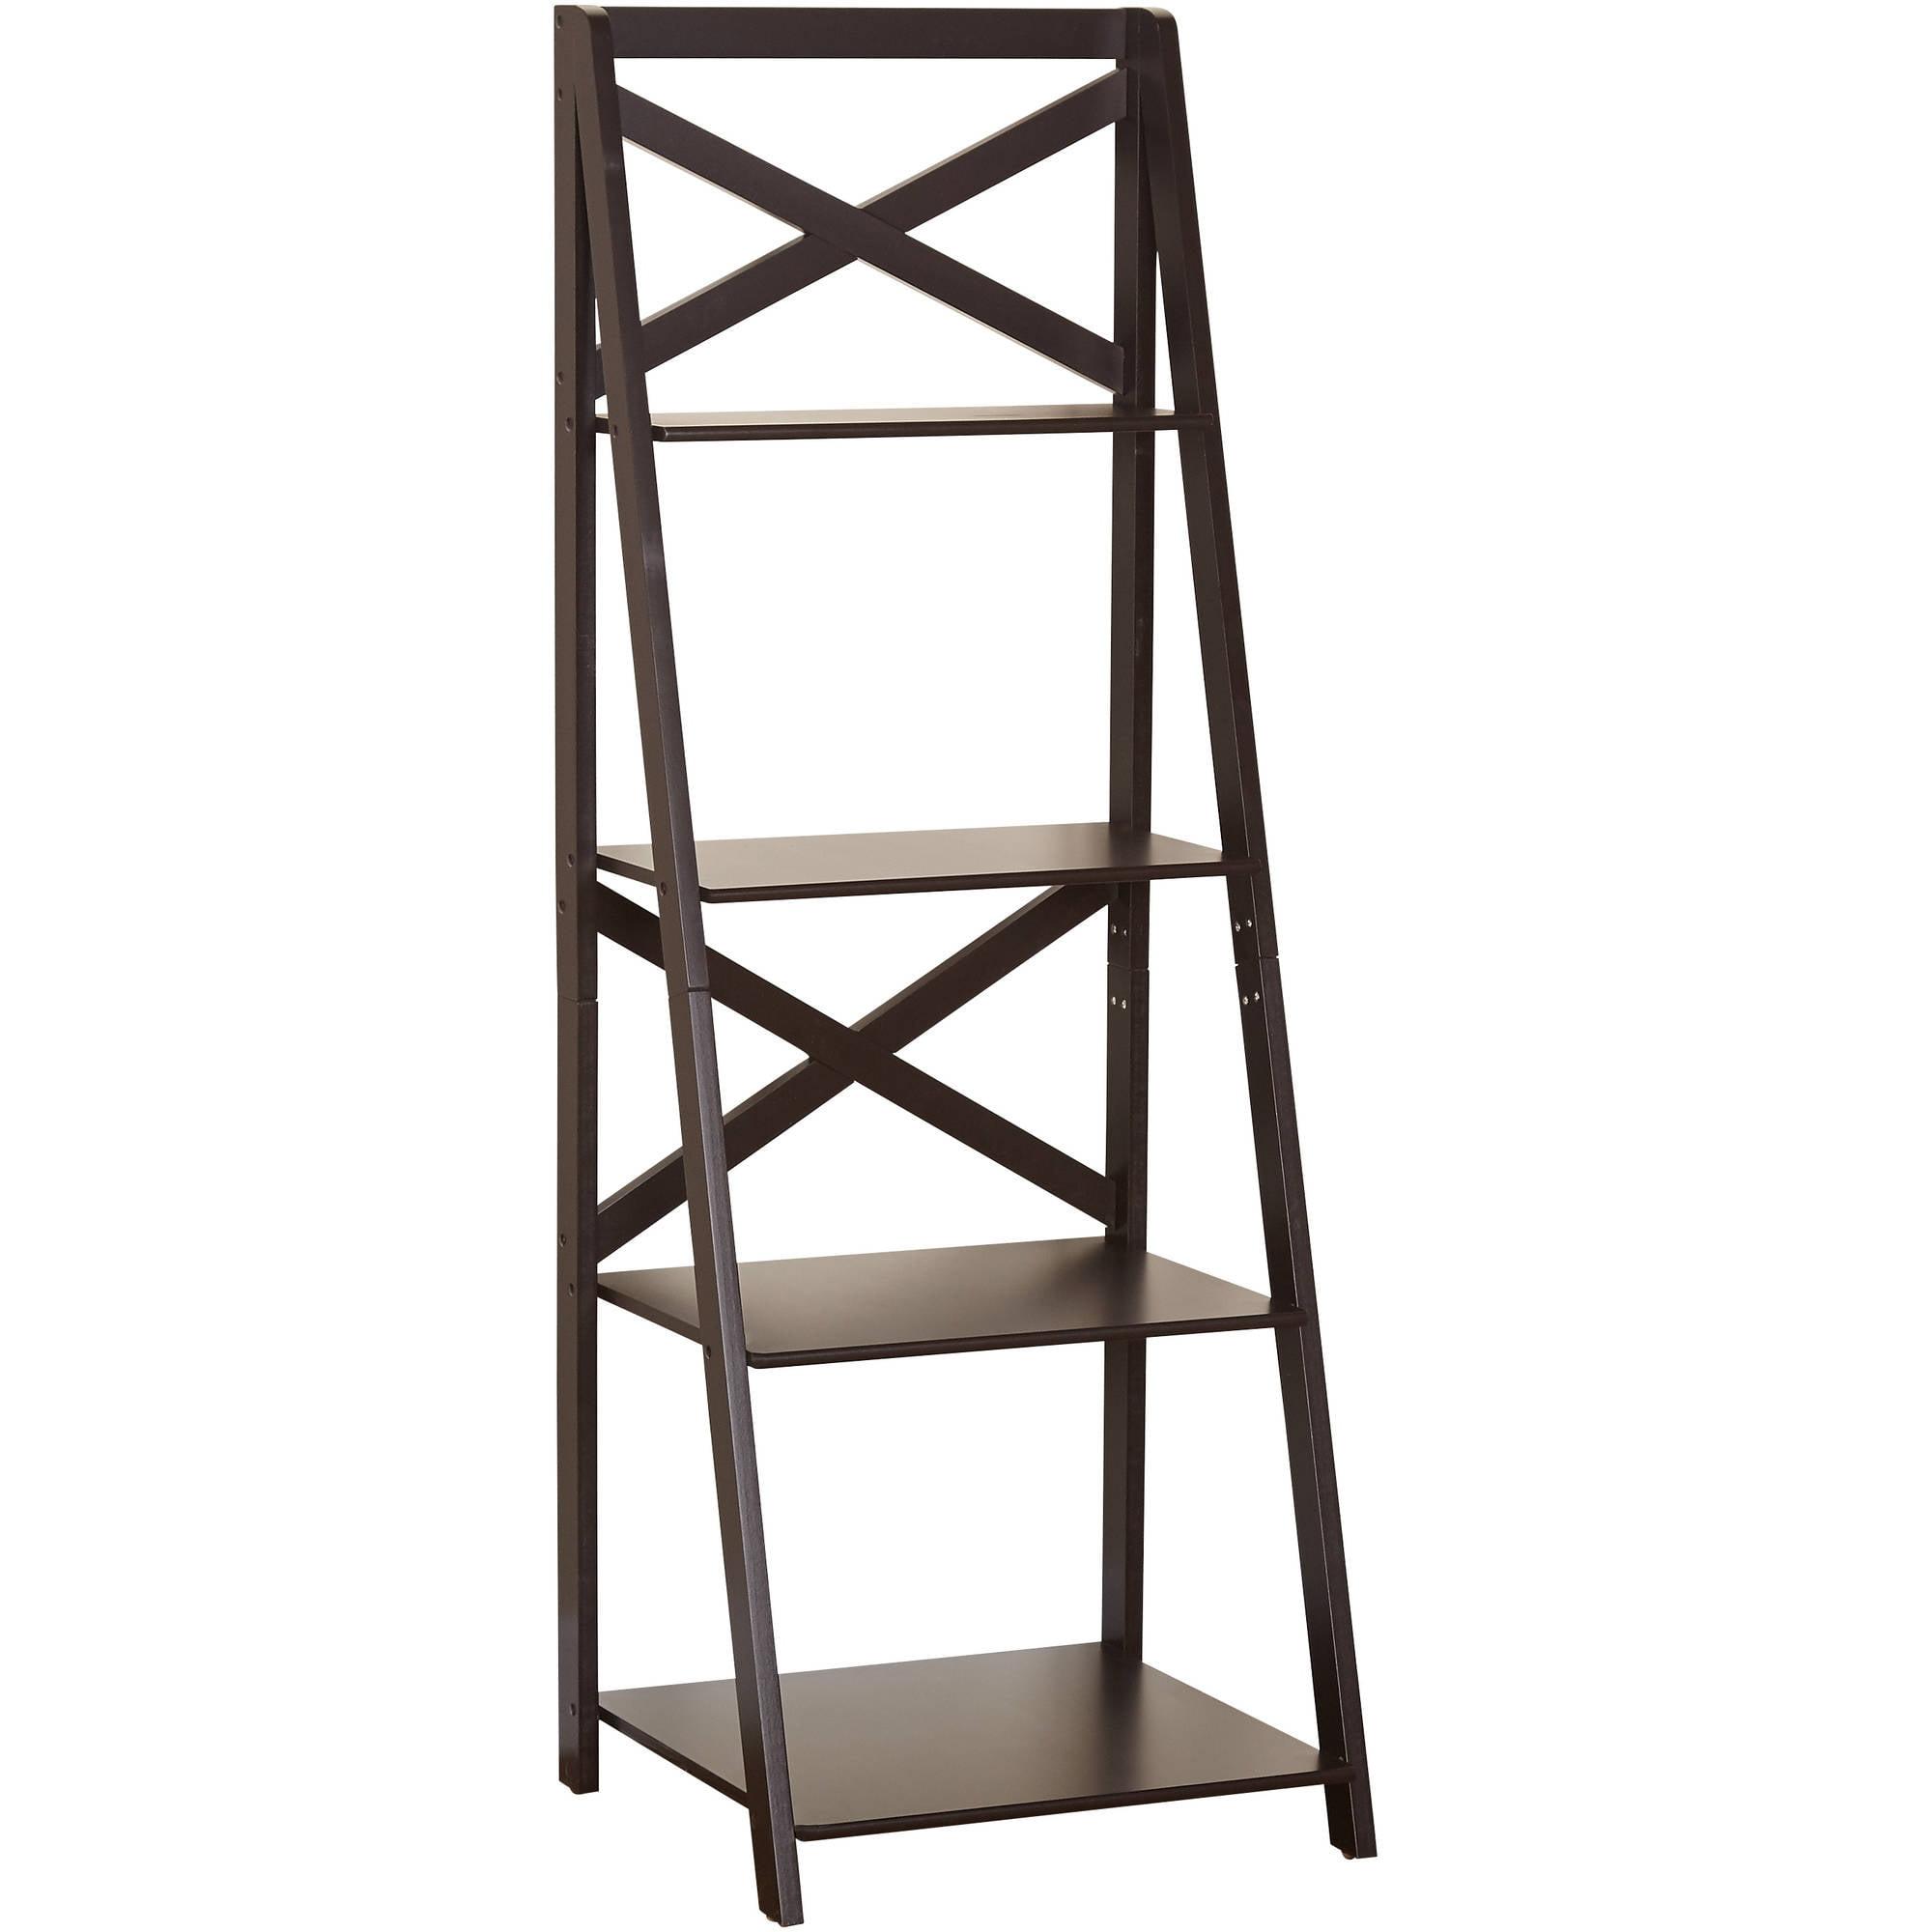 Details About Bookshelf Wood Storage Display Shelf Wall Ladder Bookcase Furniture 4 Tire Wide